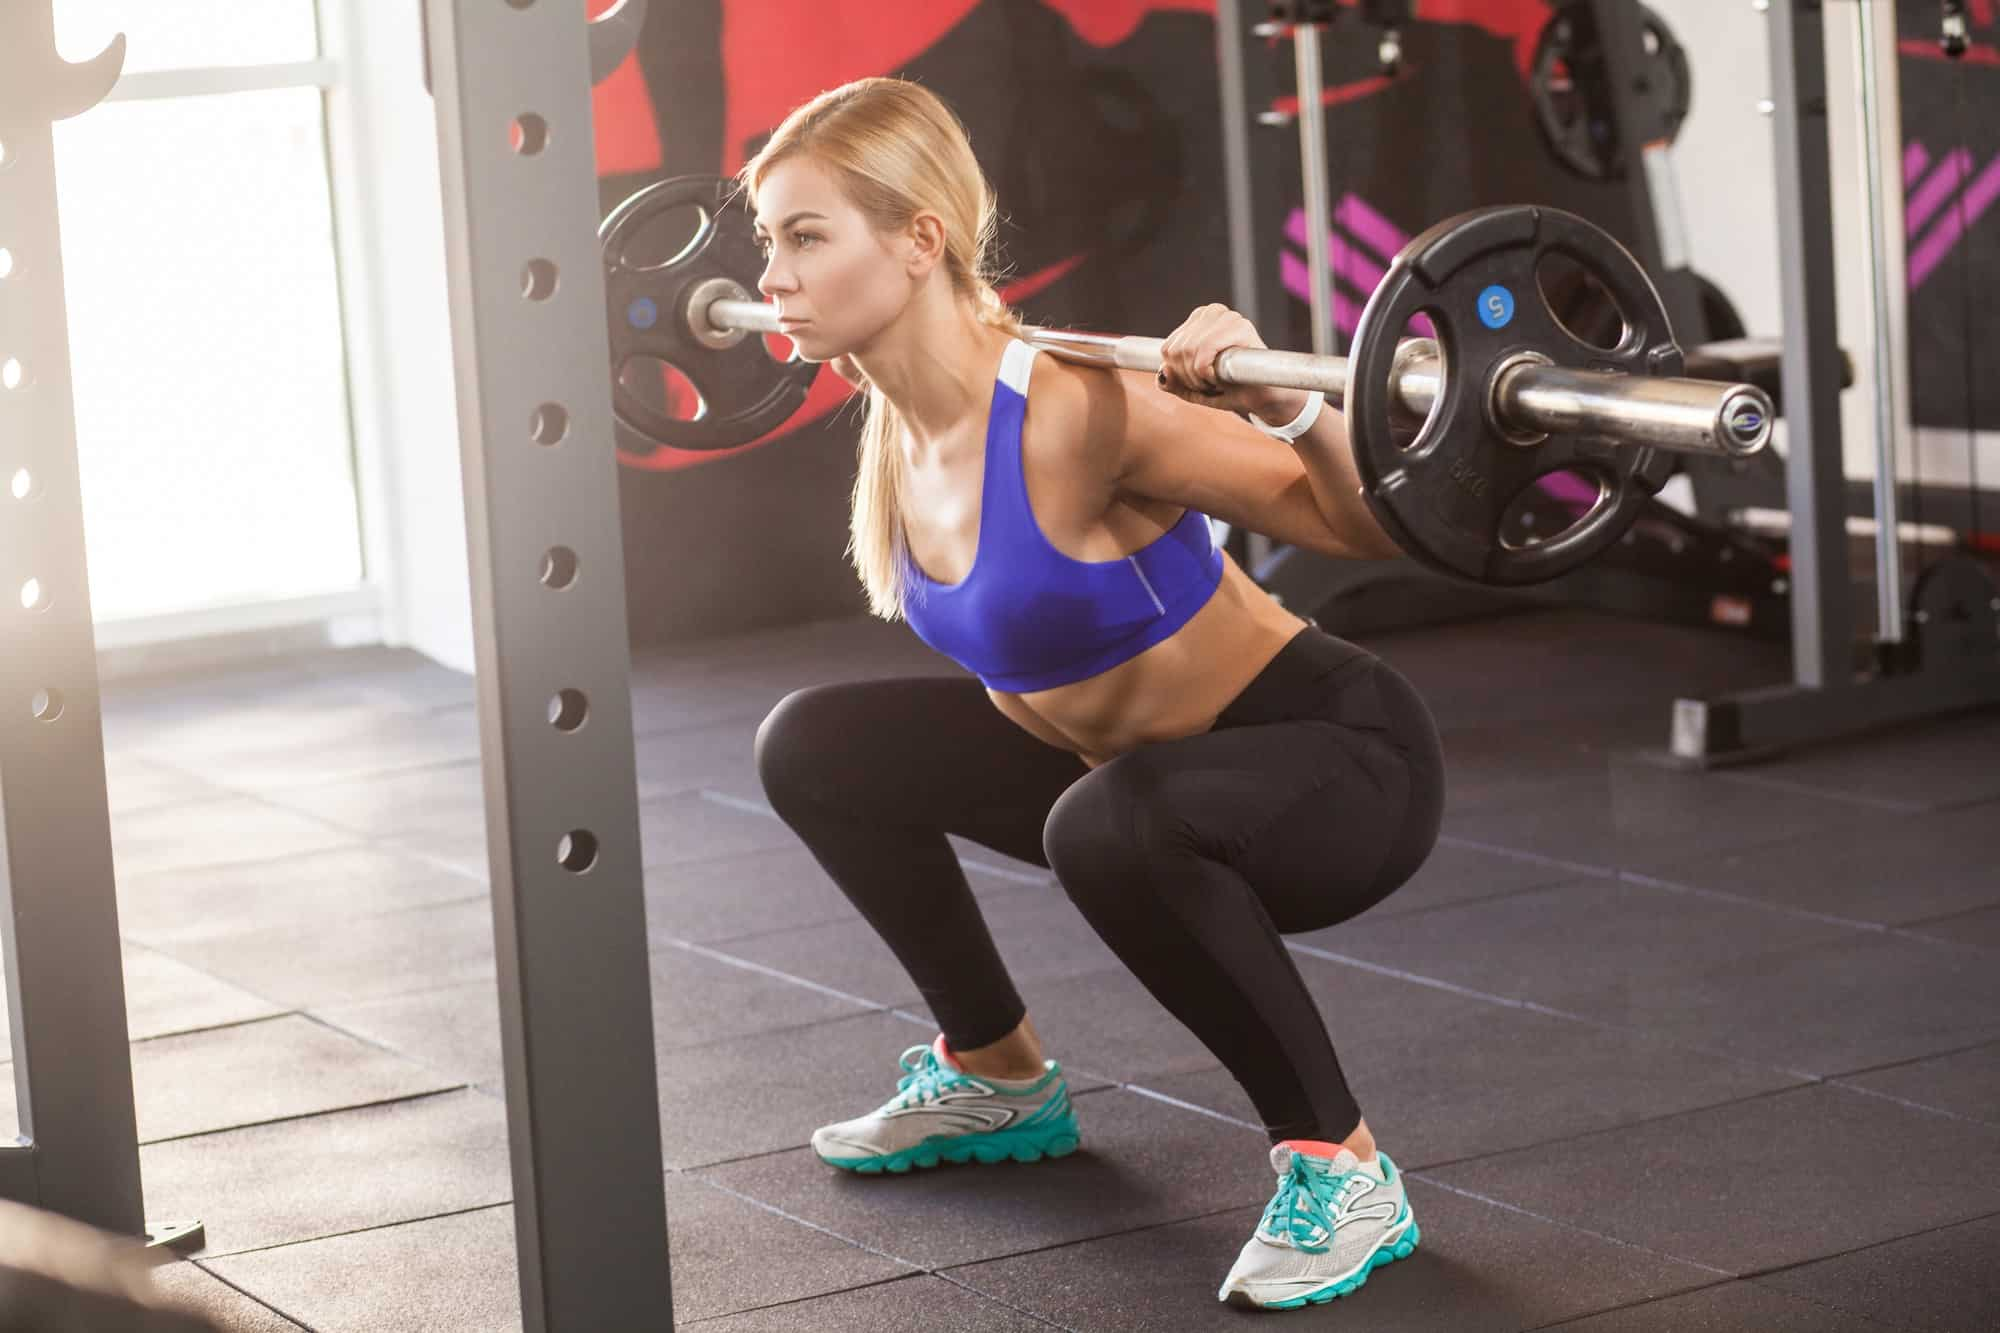 oefening fitness schema voor vrouwen spiermassa